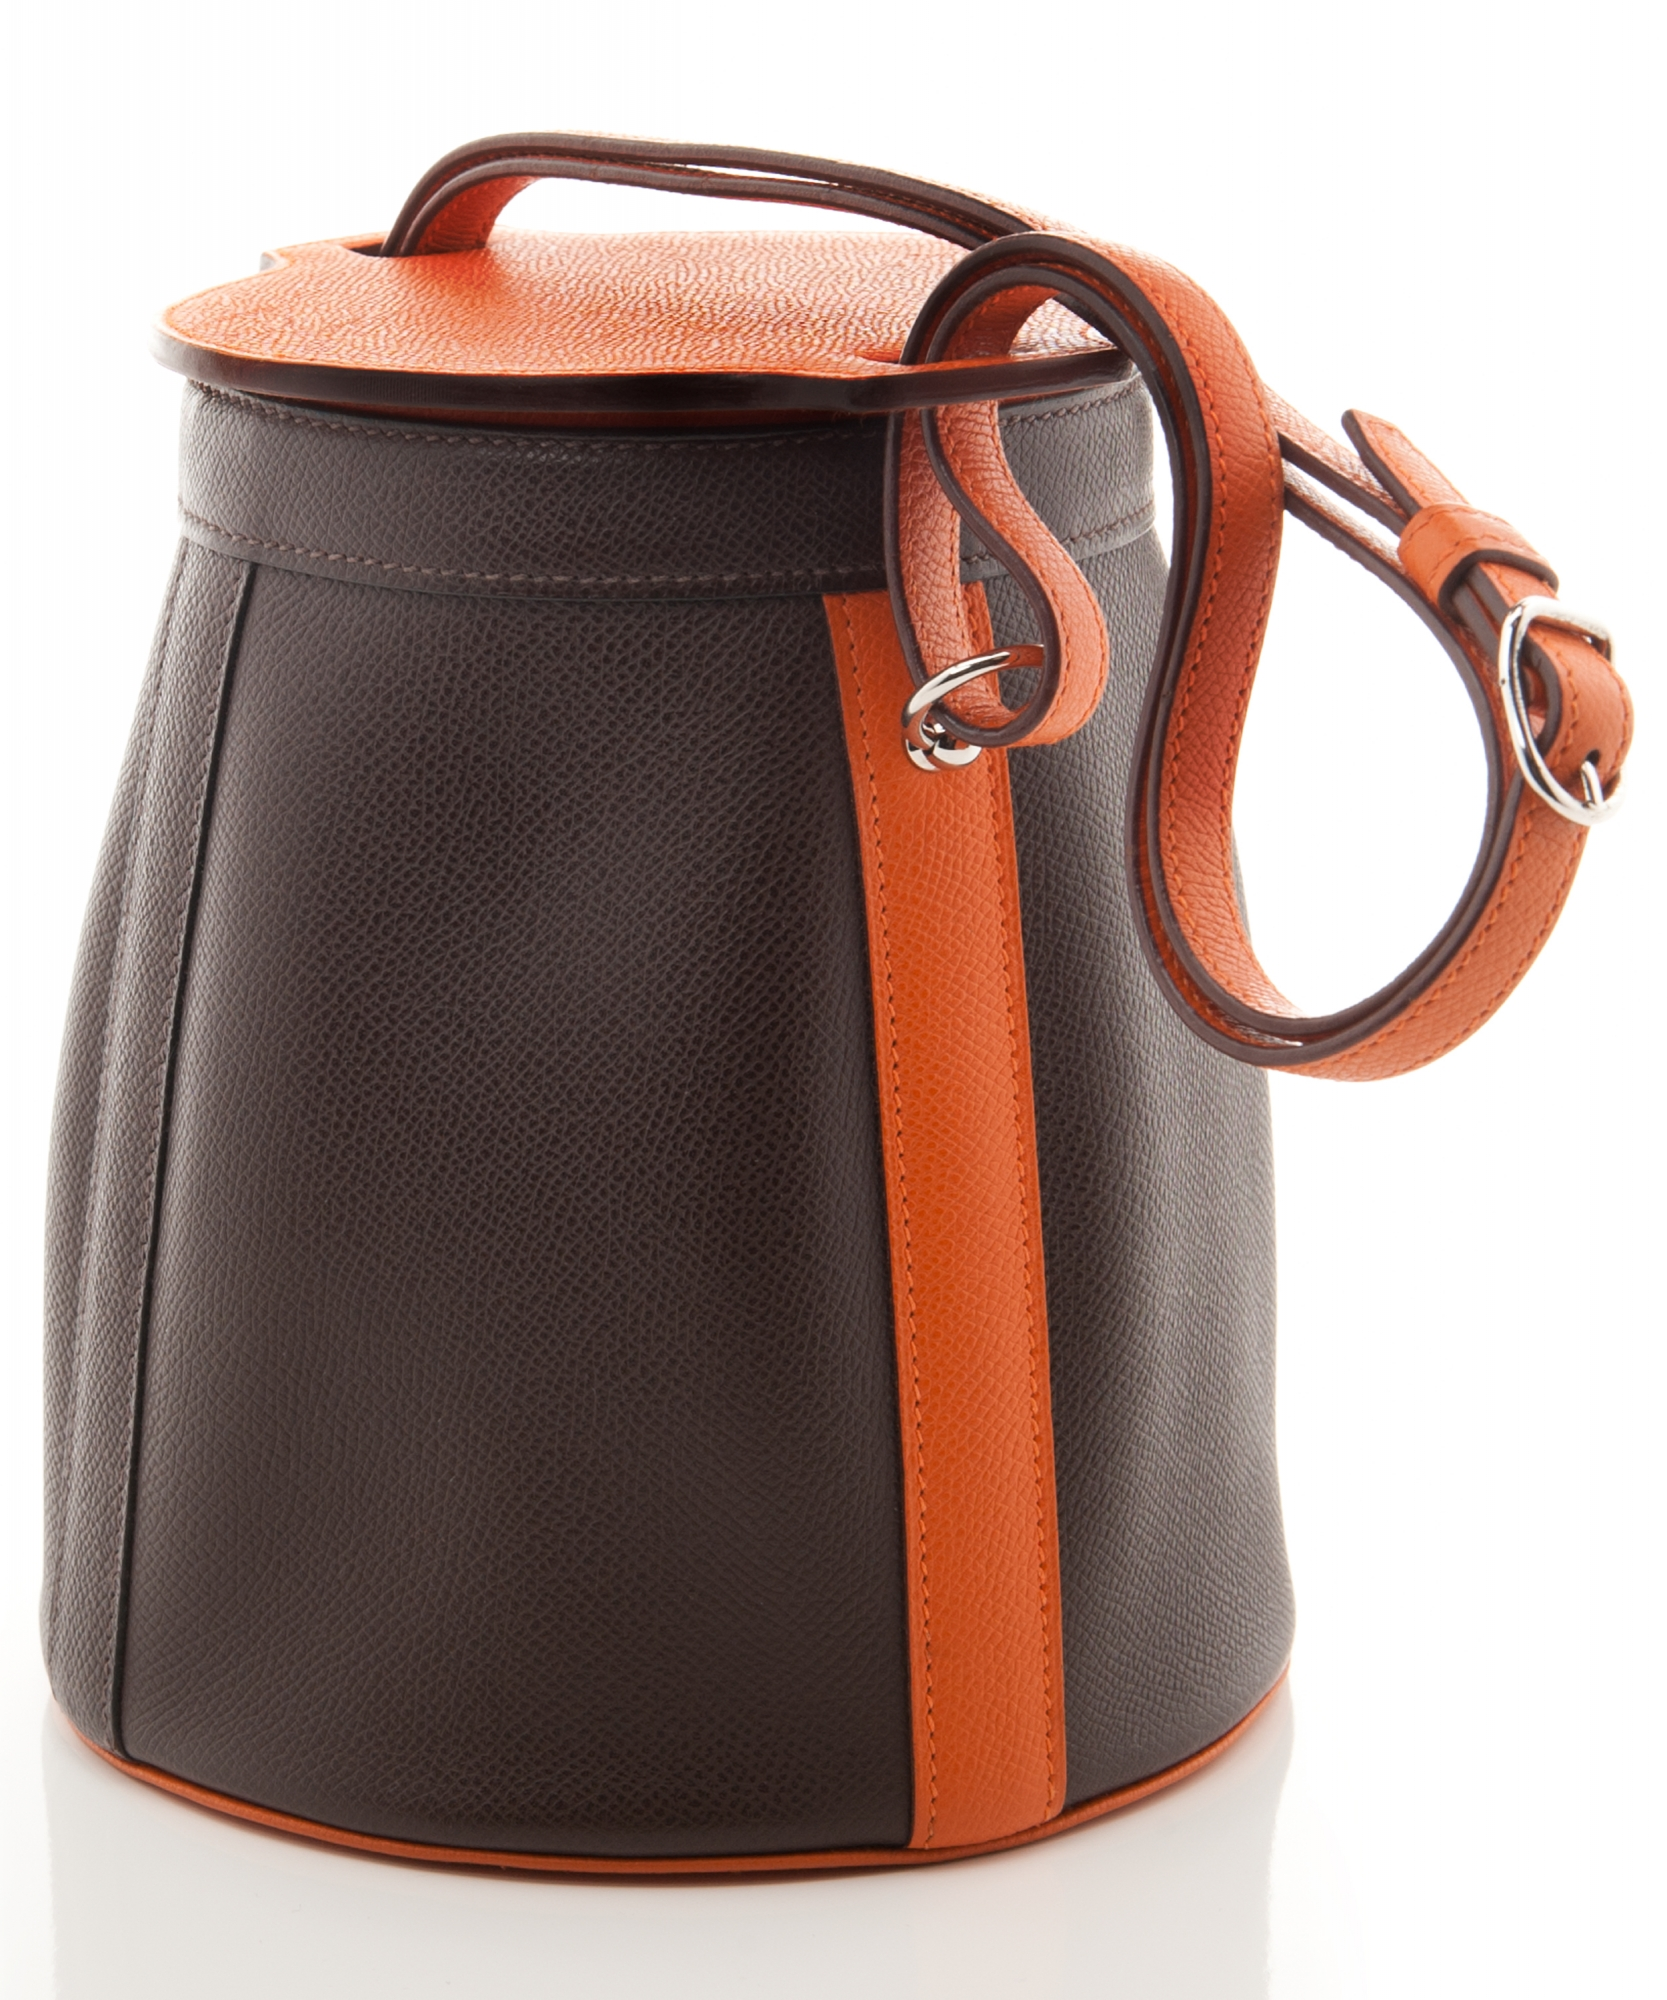 Herm 232 S Brown Orange Leather Farming Bag La Doyenne